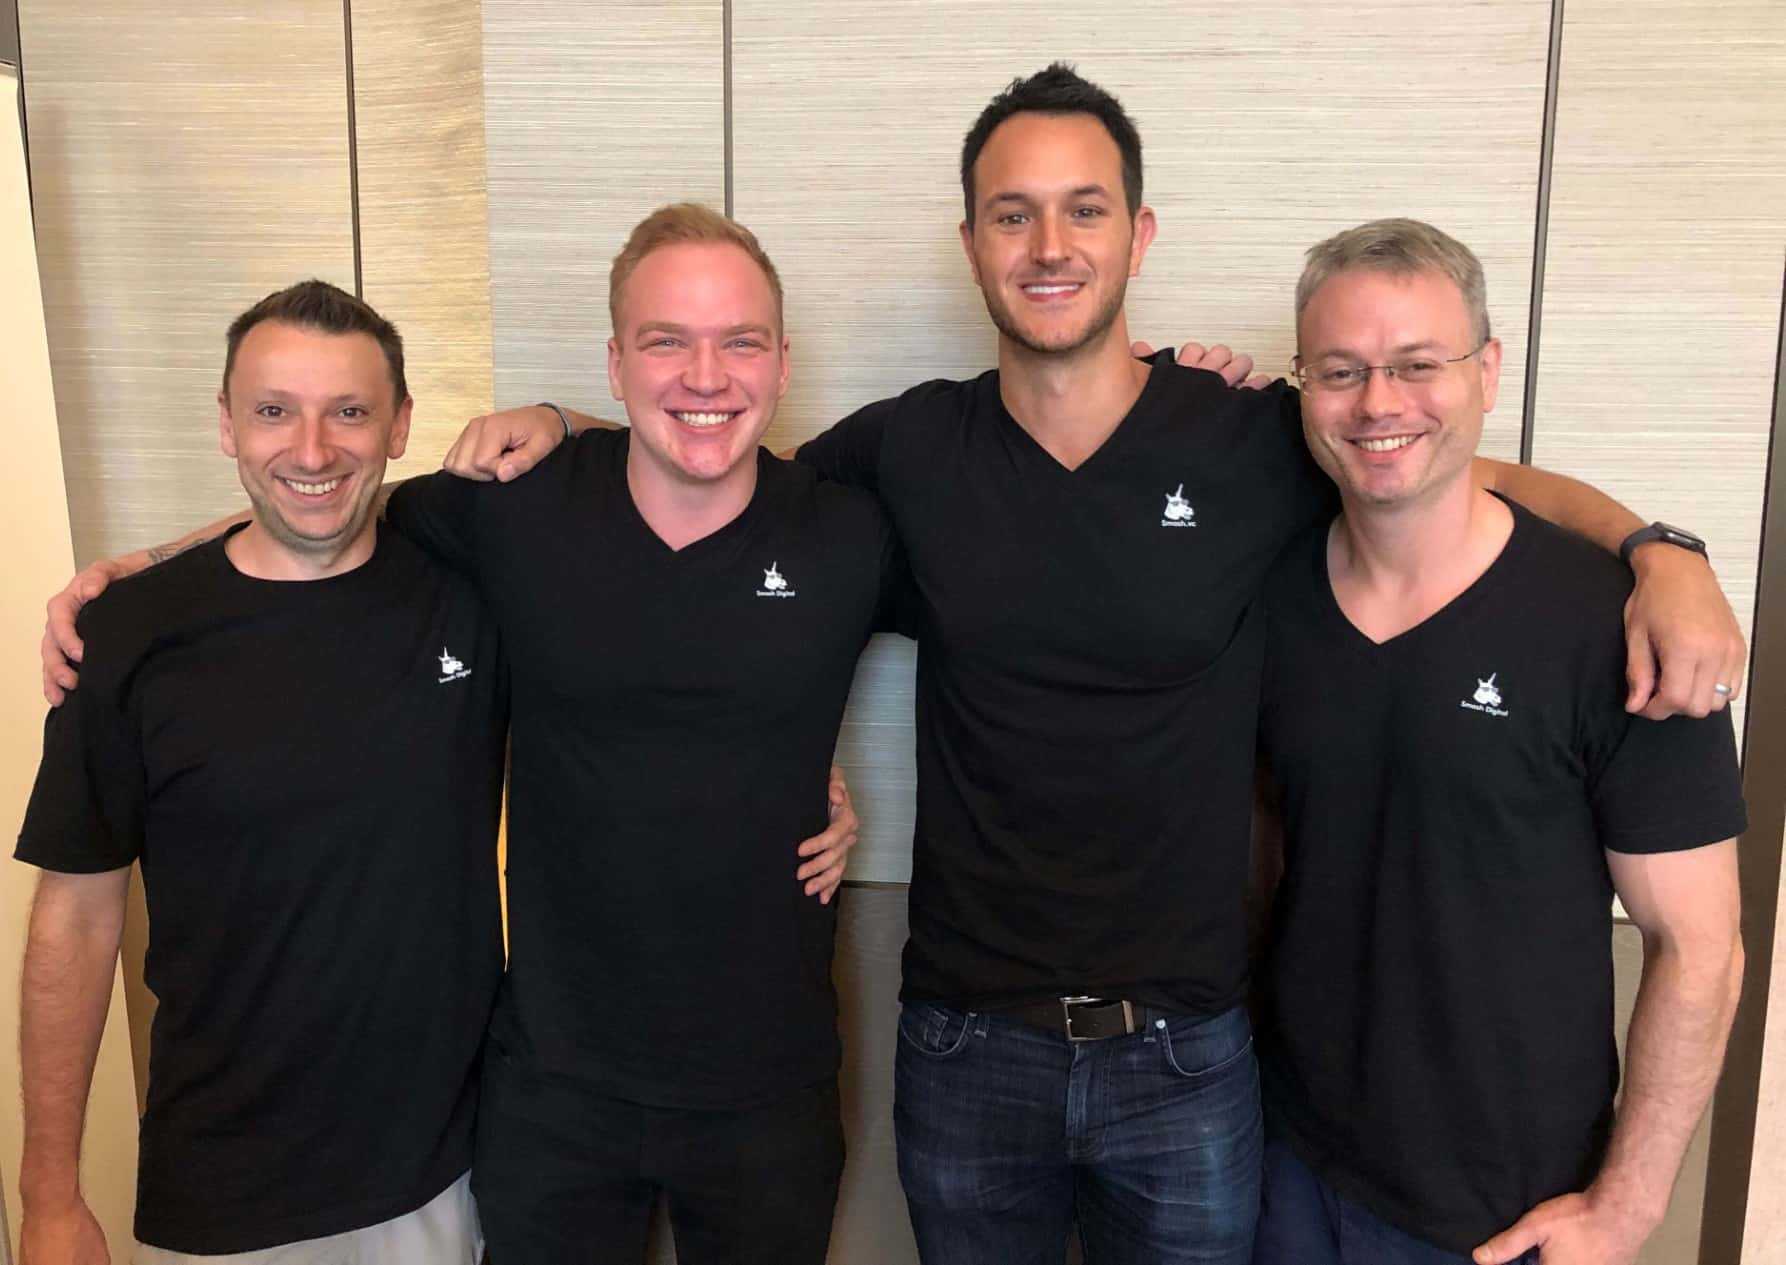 The Smash Digital team